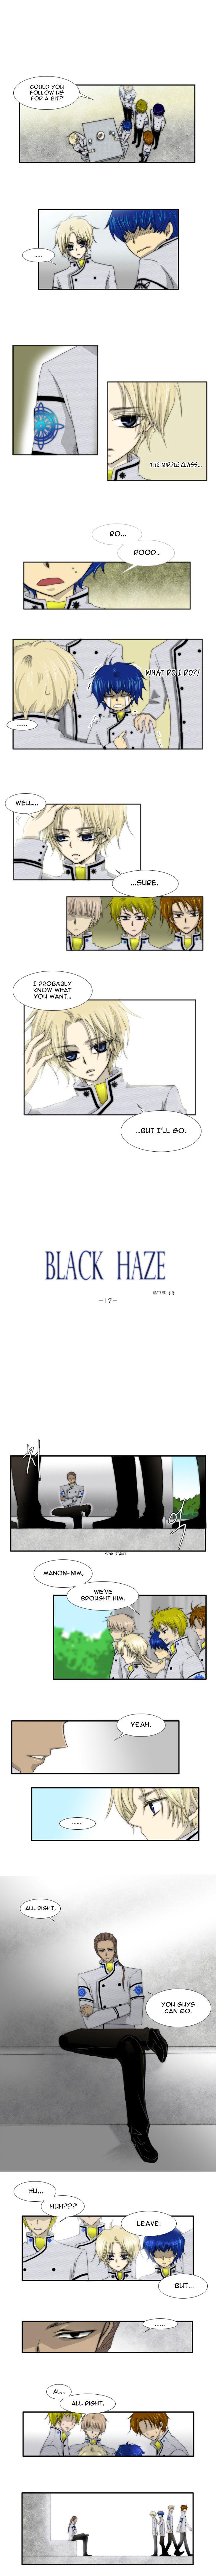 Black Haze 17 Page 1